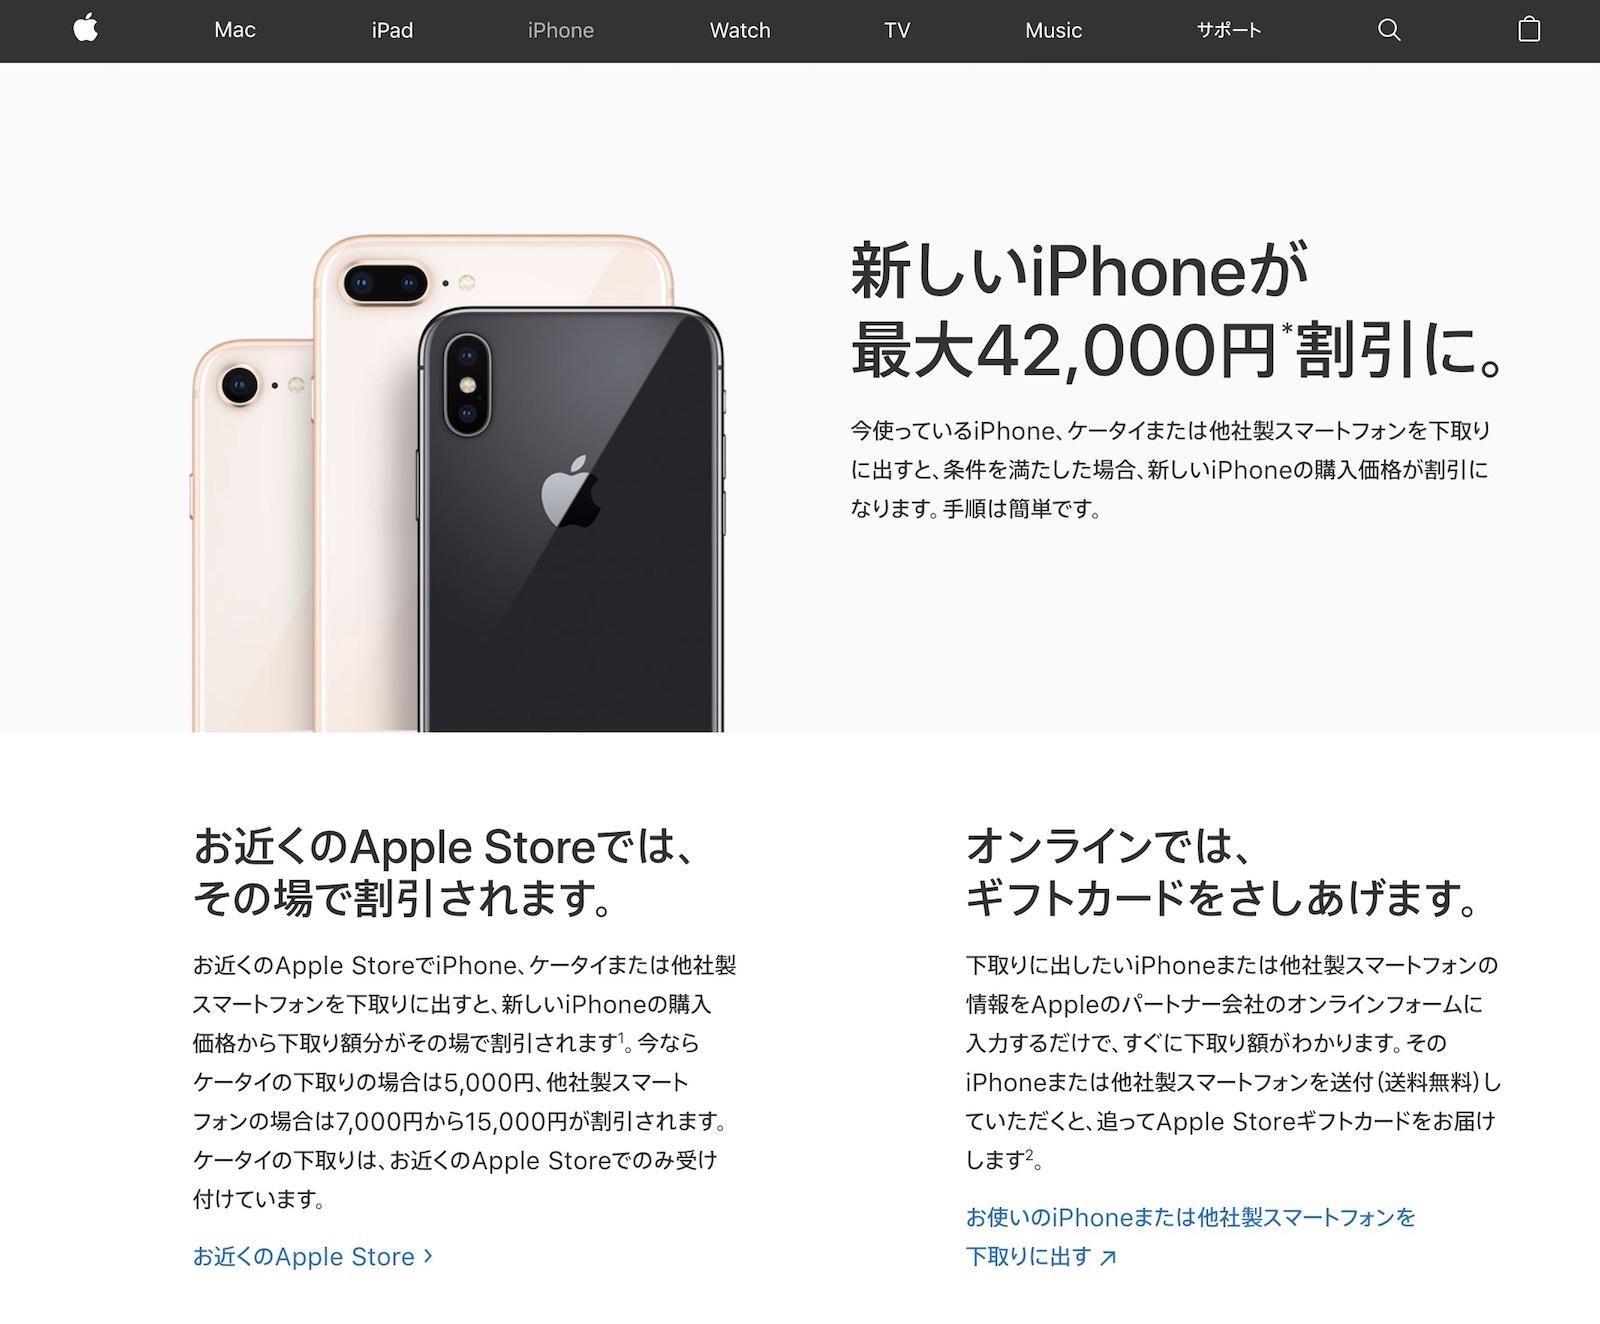 iPhone-Trade-In-Program-201802.jpg